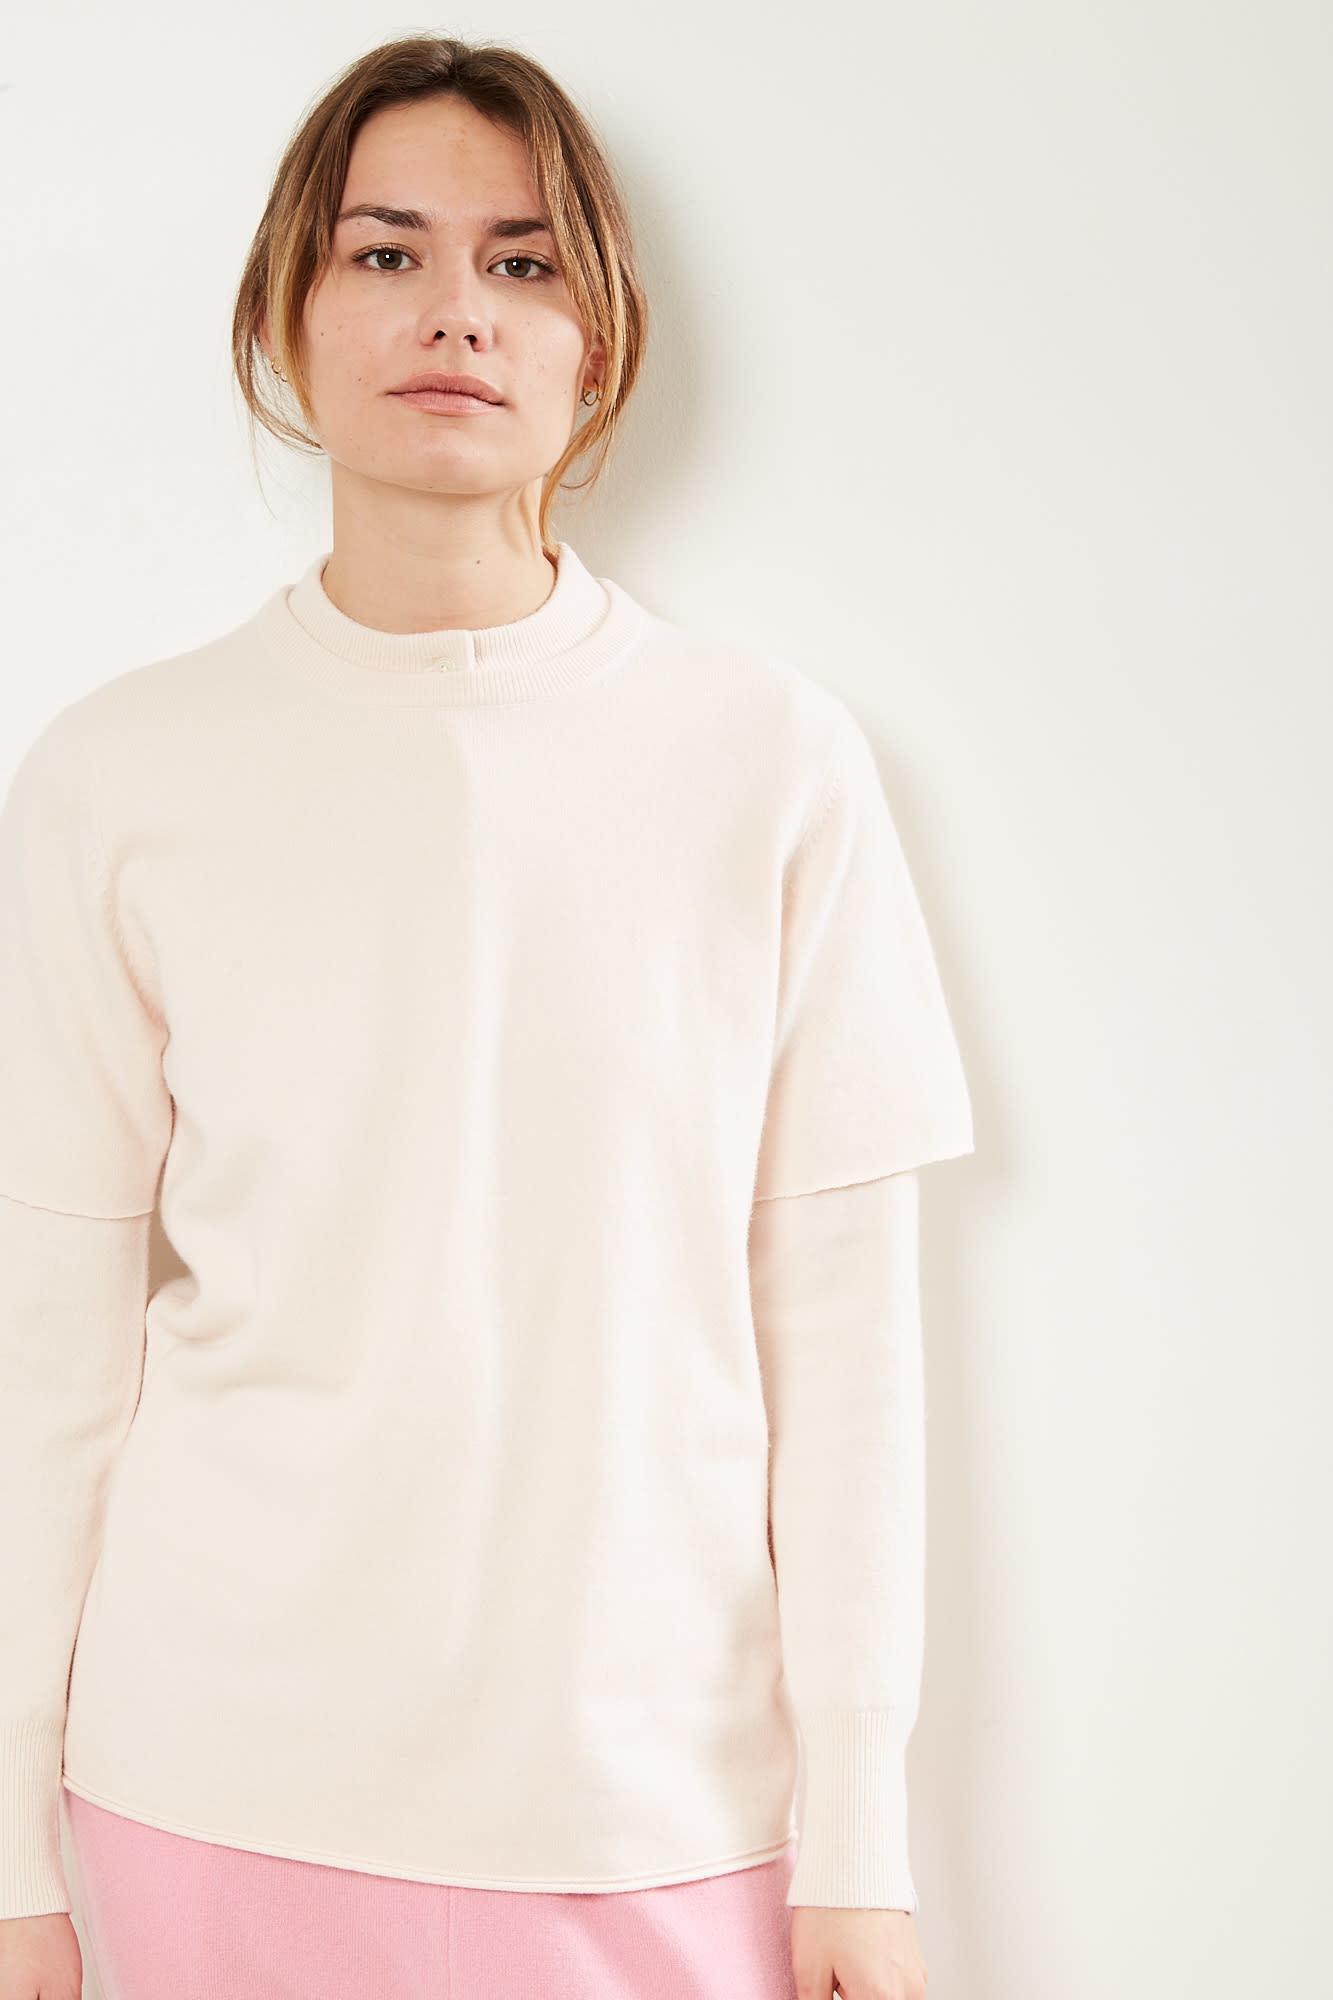 extreme cashmere - No64 classic unisex tshirt